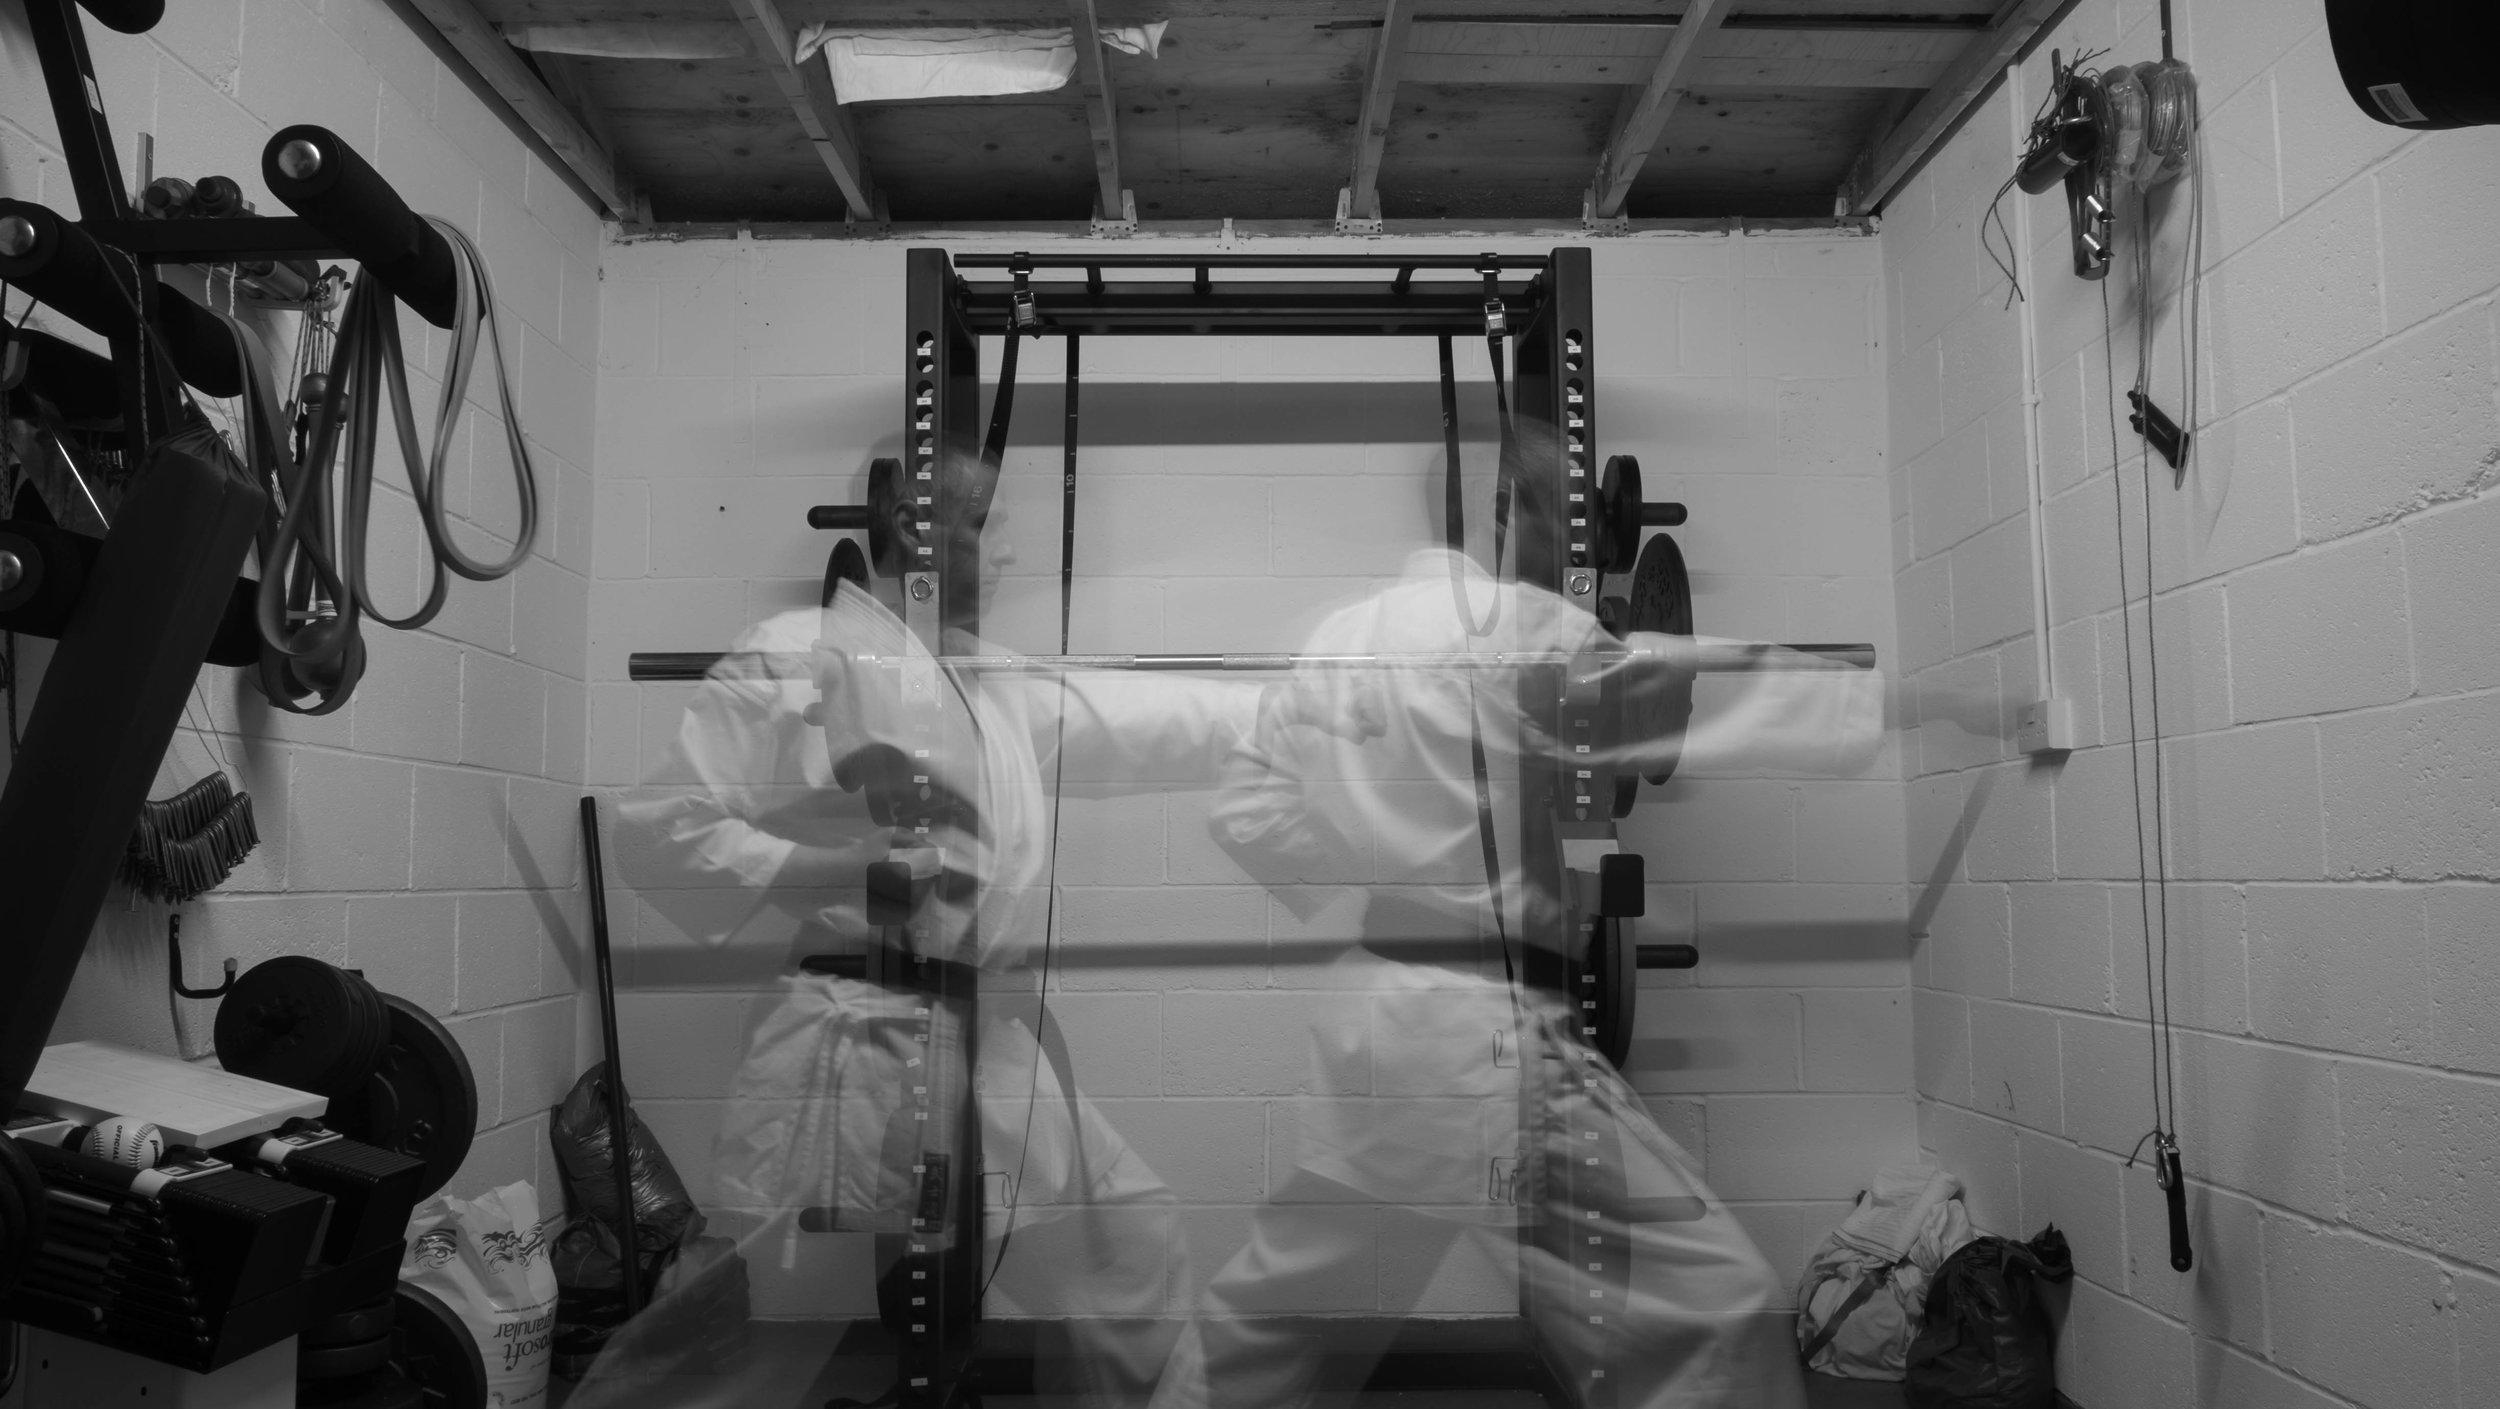 Fuji X70 - Karate Training